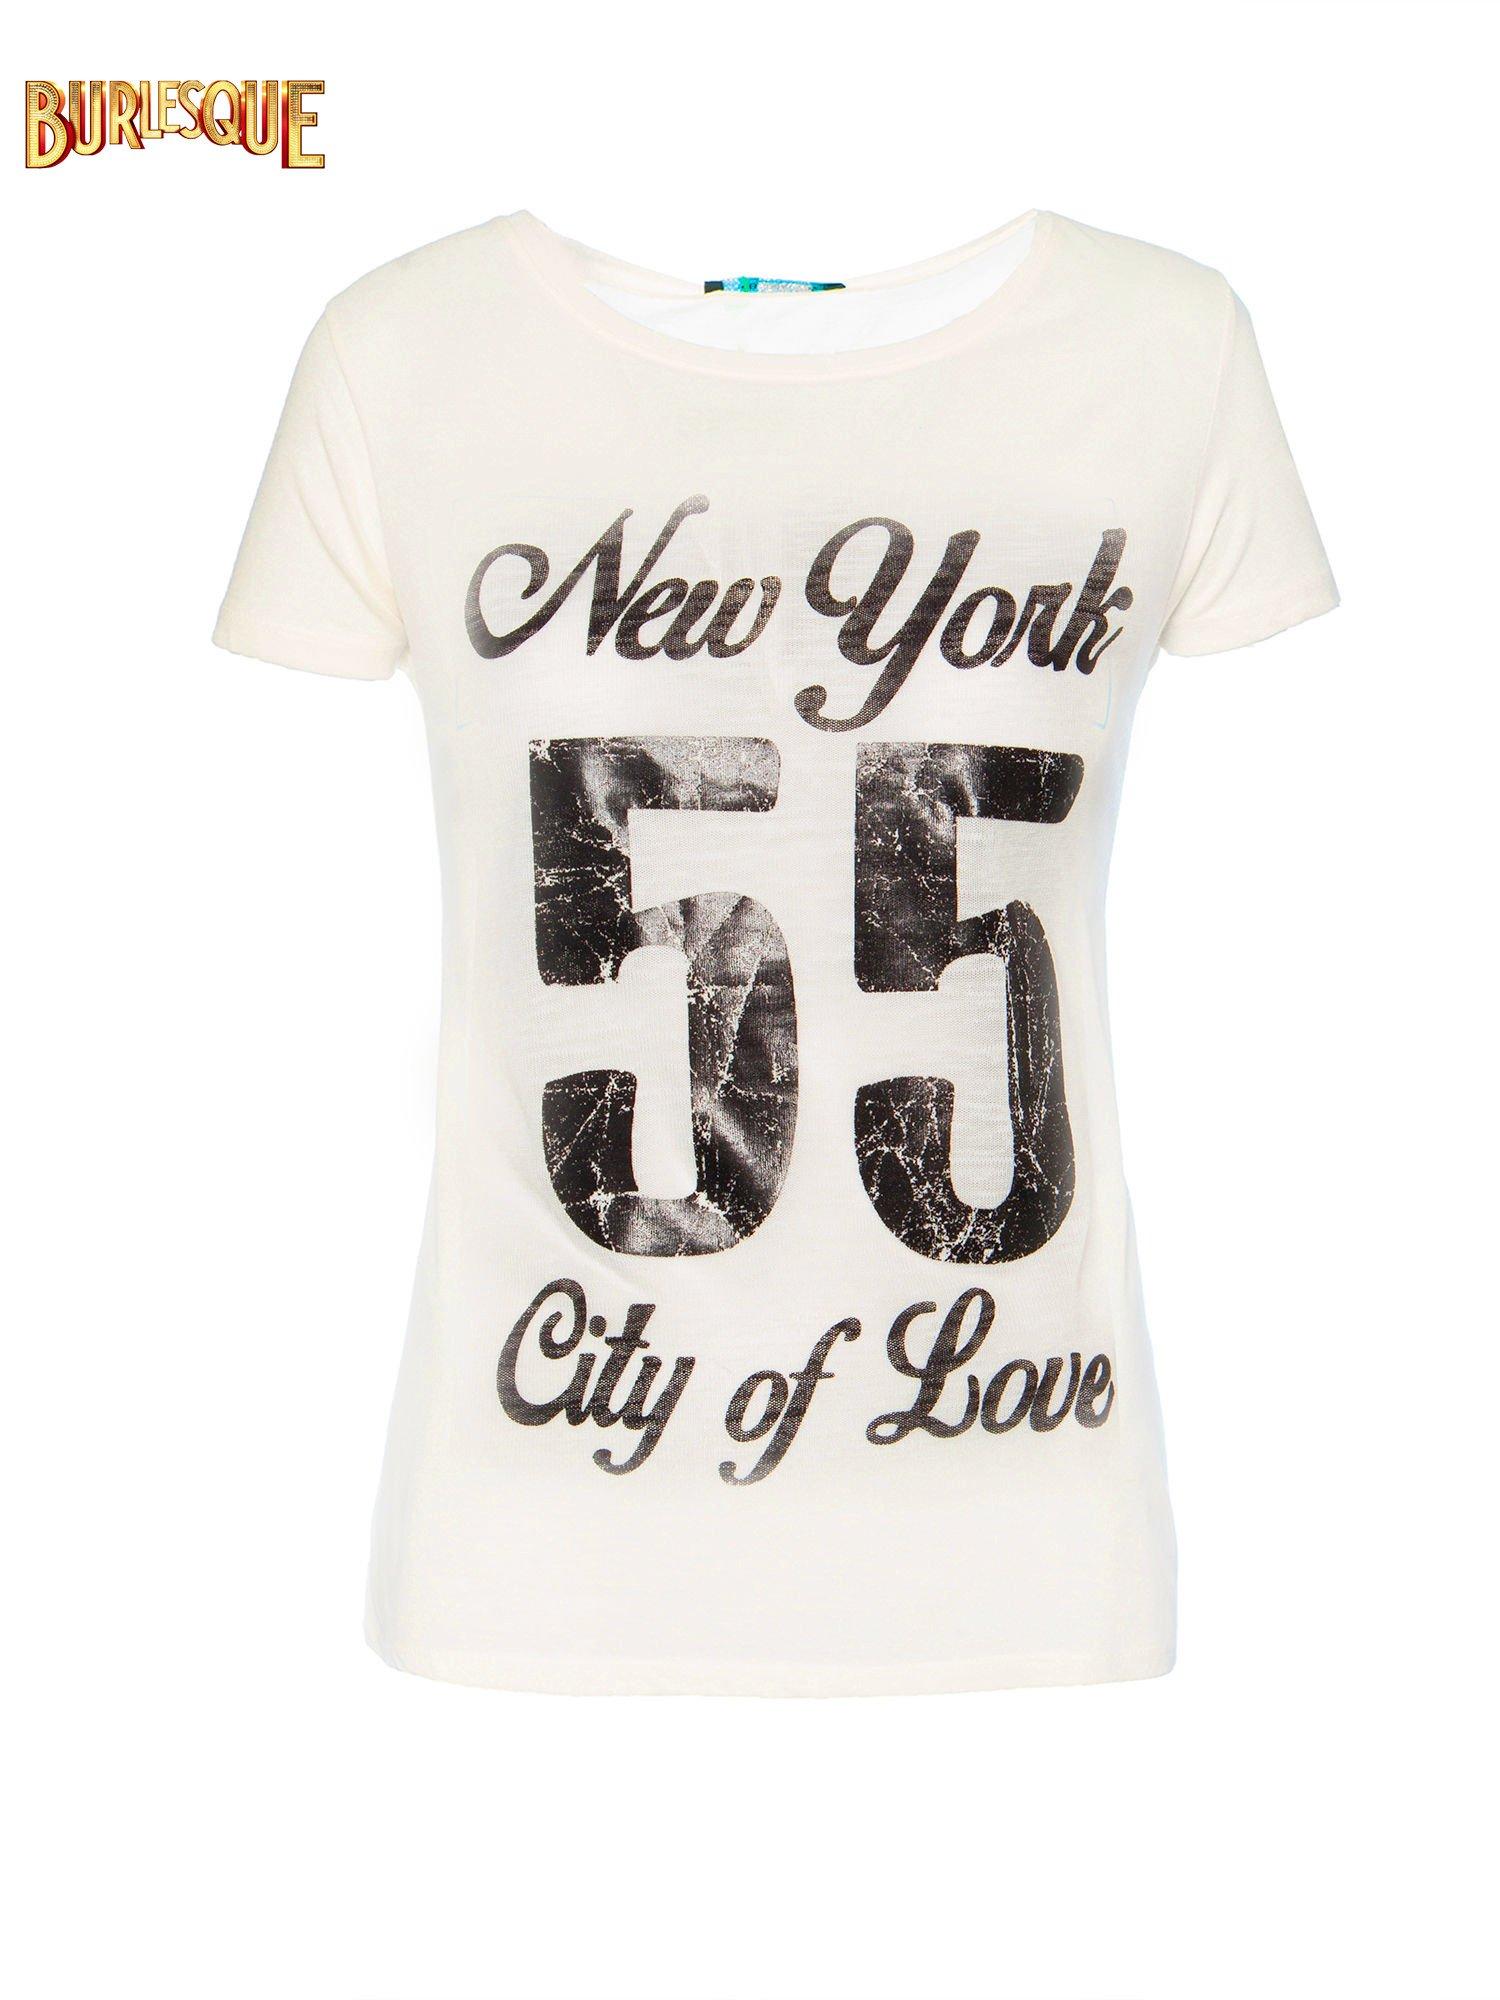 Ciemnyecru t-shirt z napisem NEW YORK CITY OF LOVE 55                                  zdj.                                  1